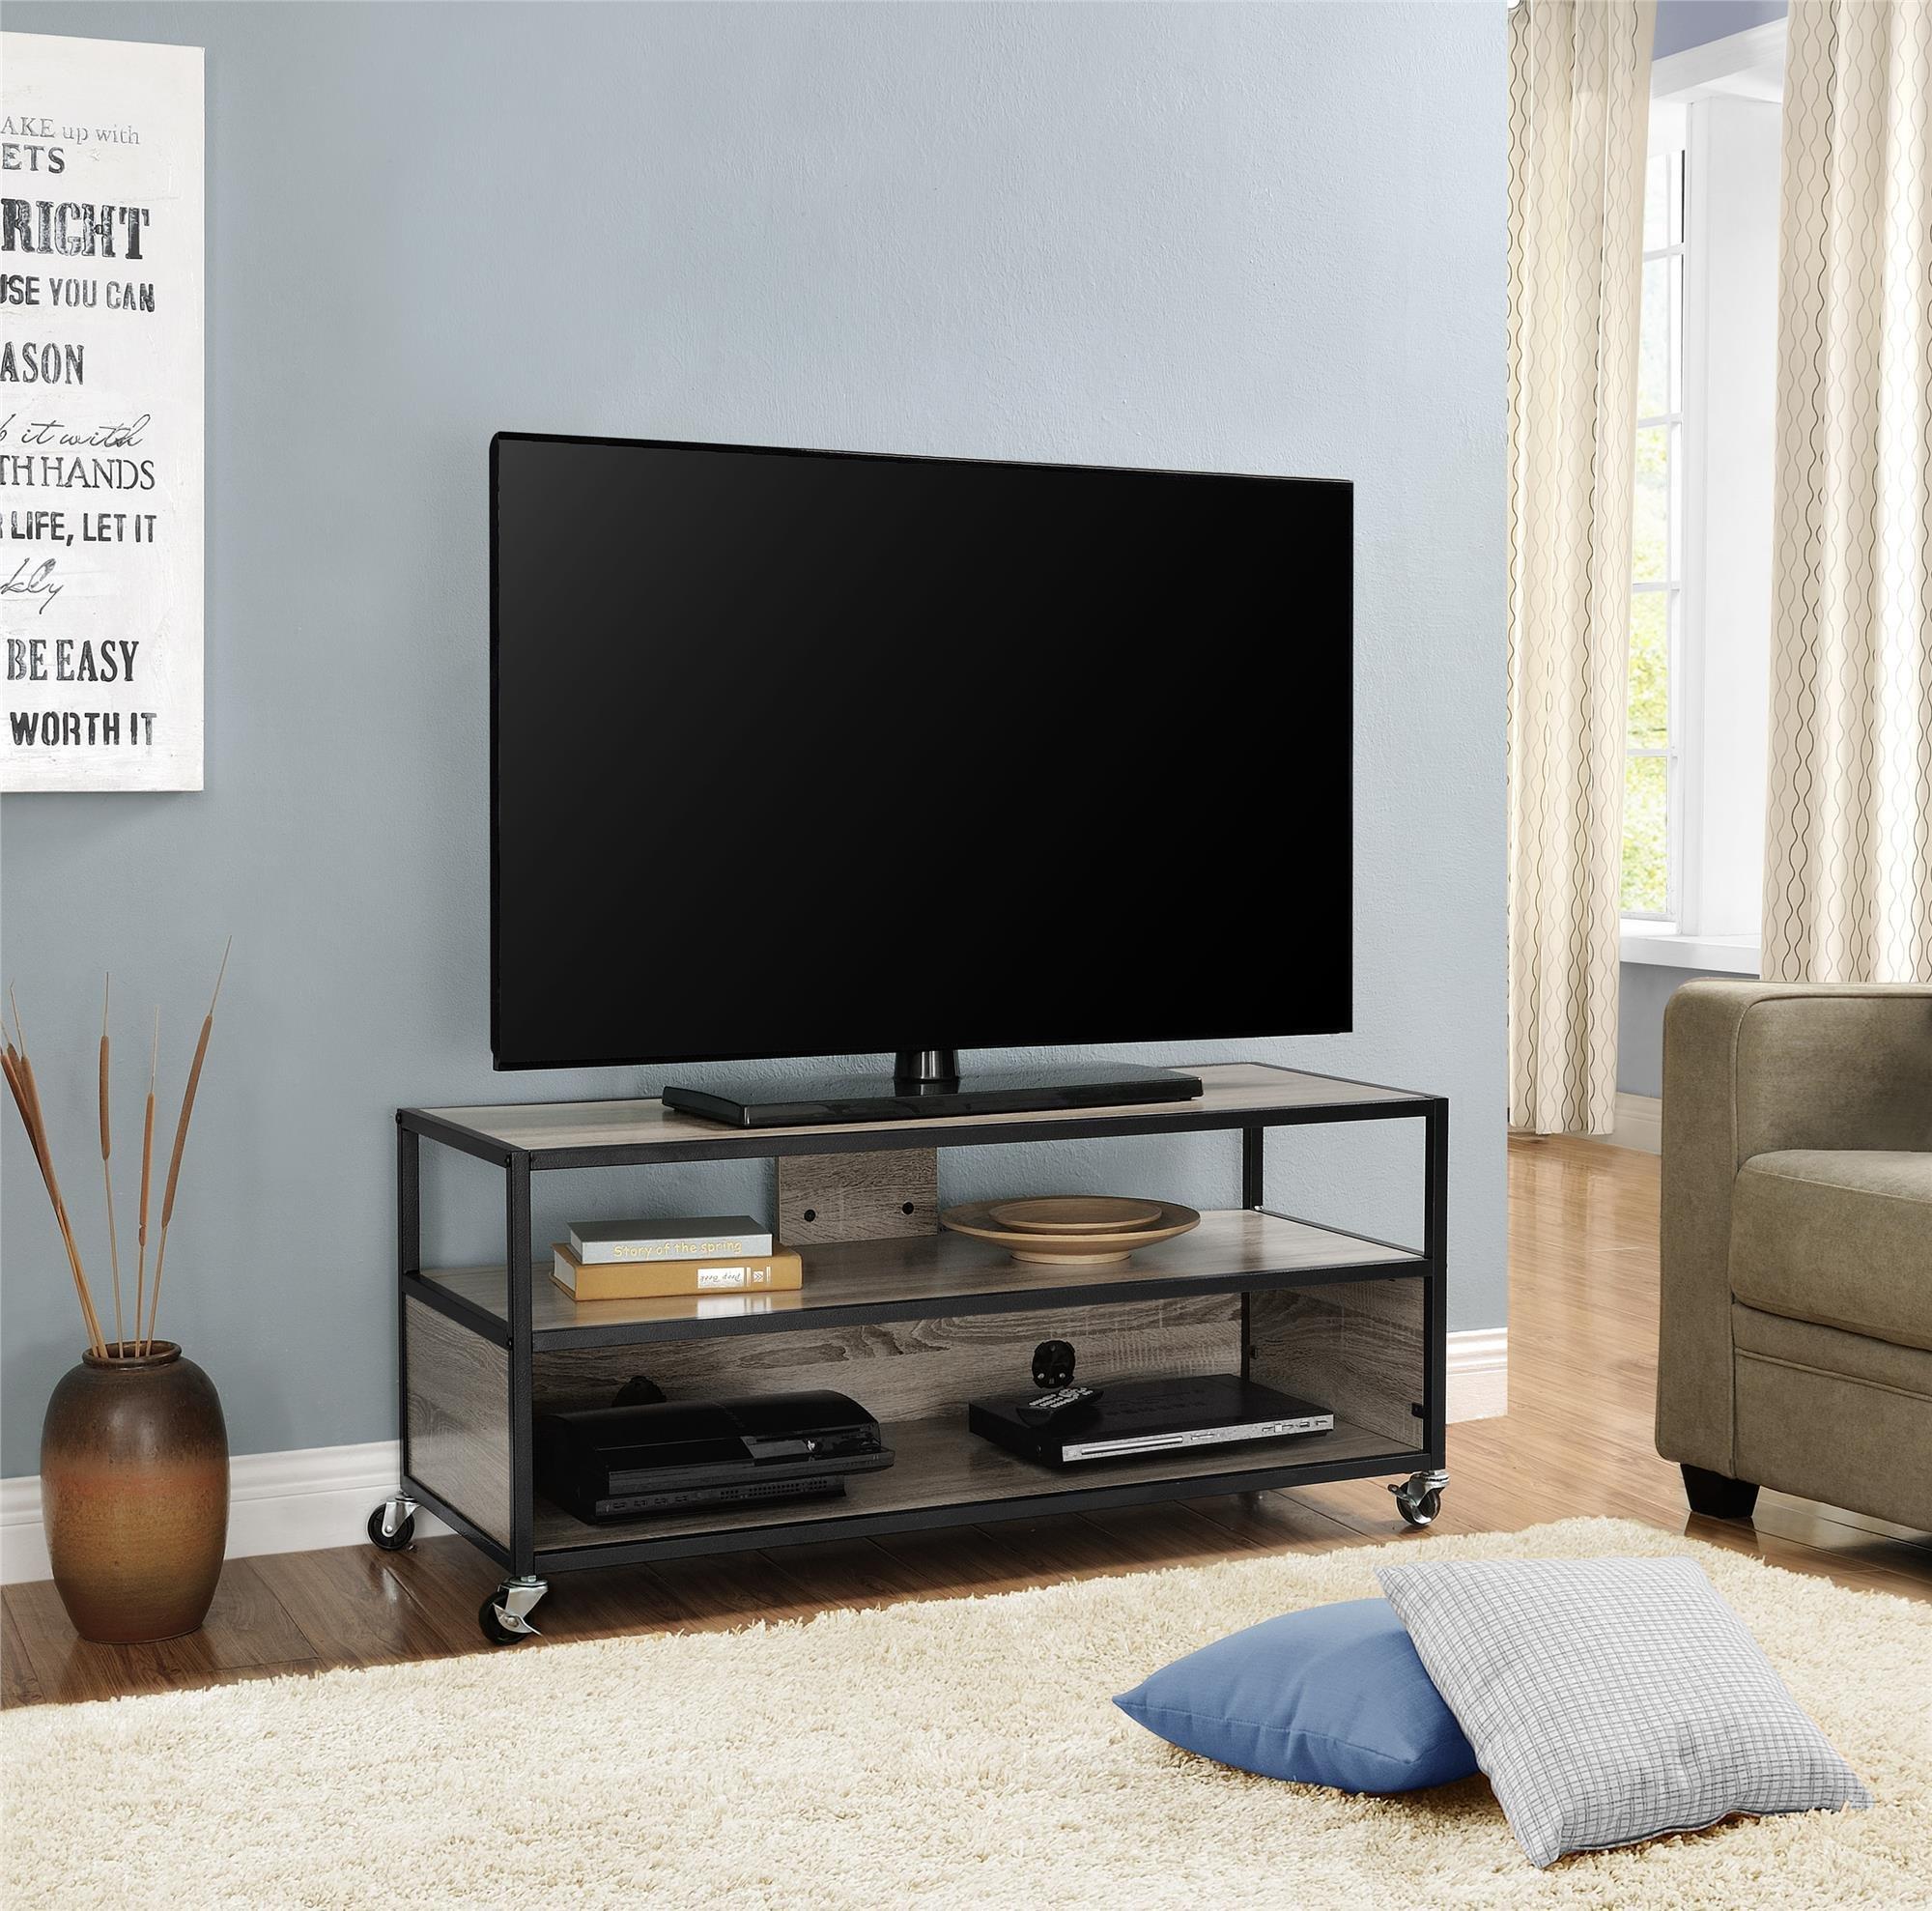 Altra Mason Ridge Mobile 46'' TV Stand with Metal Frame, Sonoma Oak/Black by Altra Furniture (Image #1)